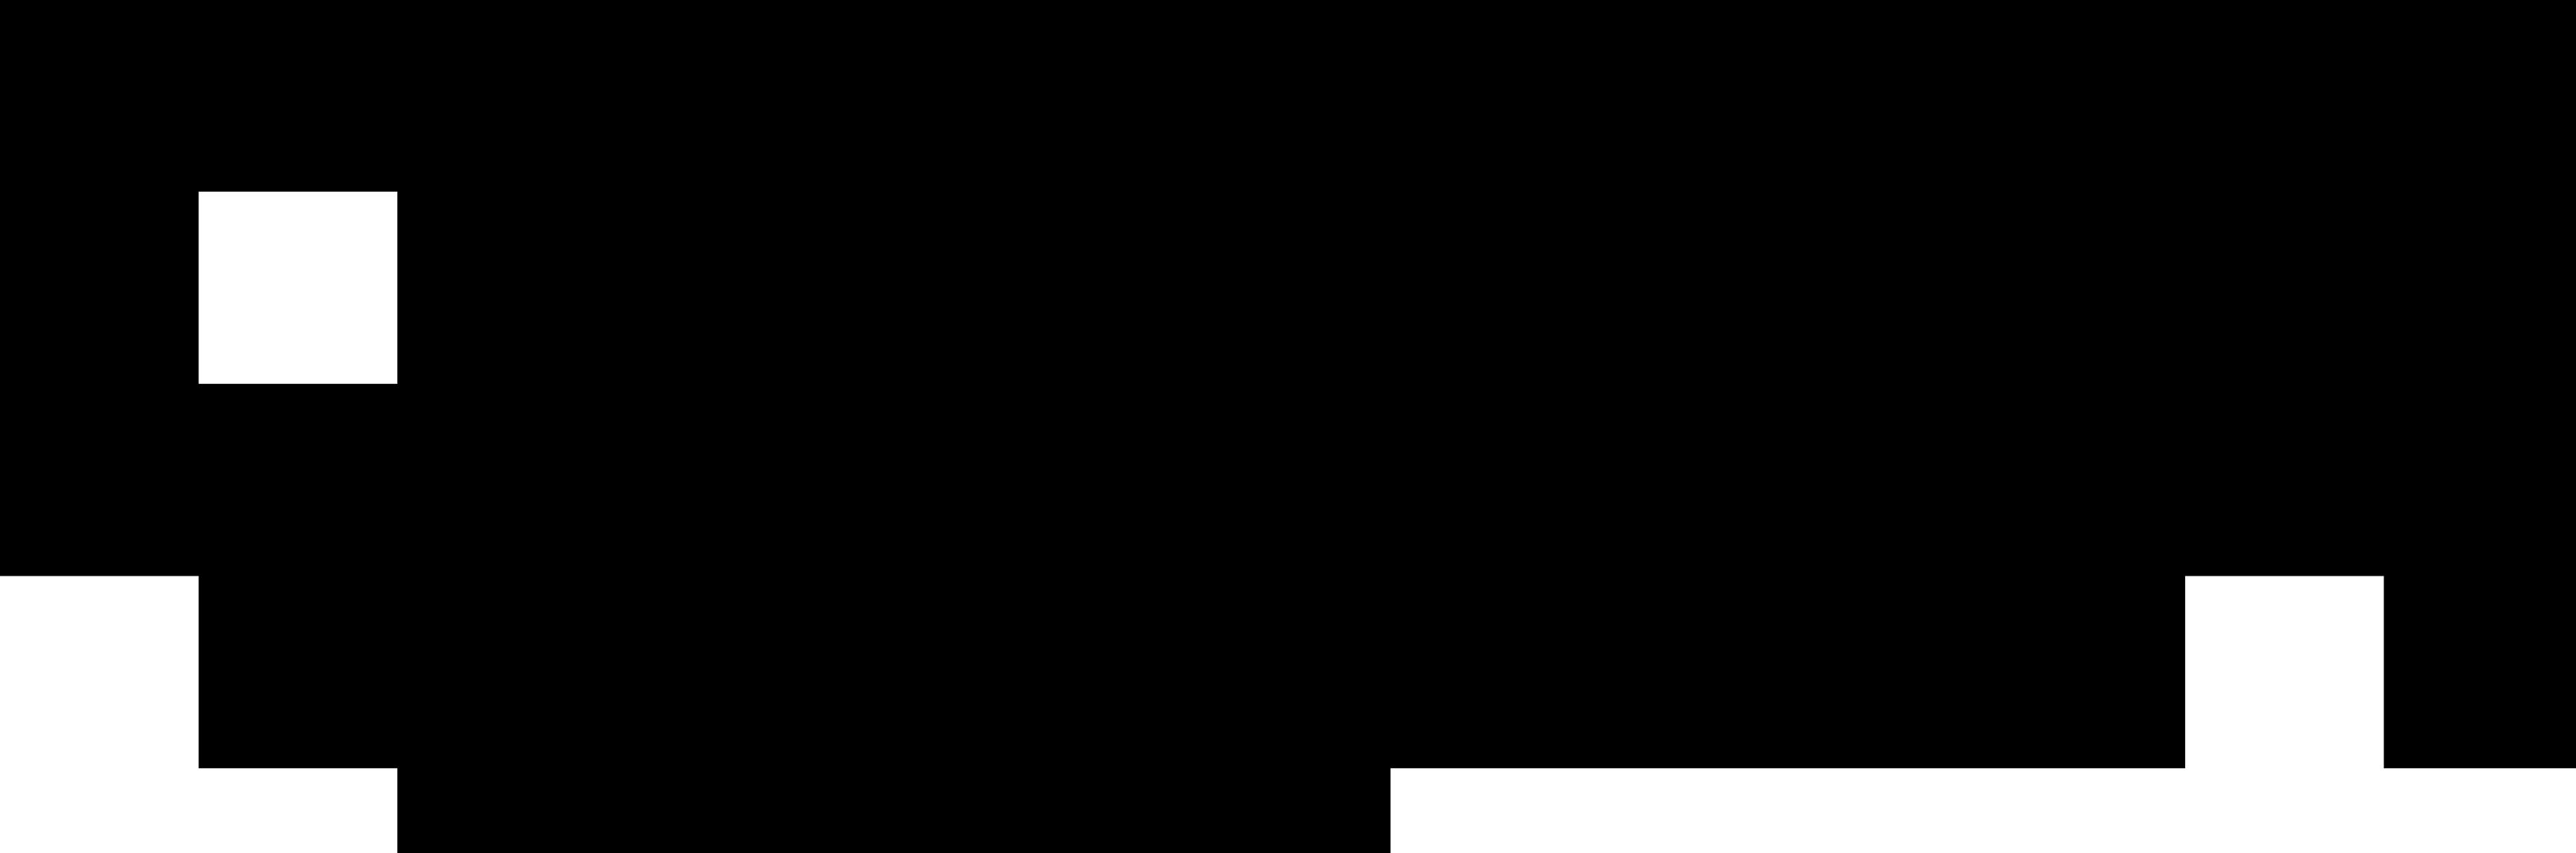 Cyber_Vision_logo